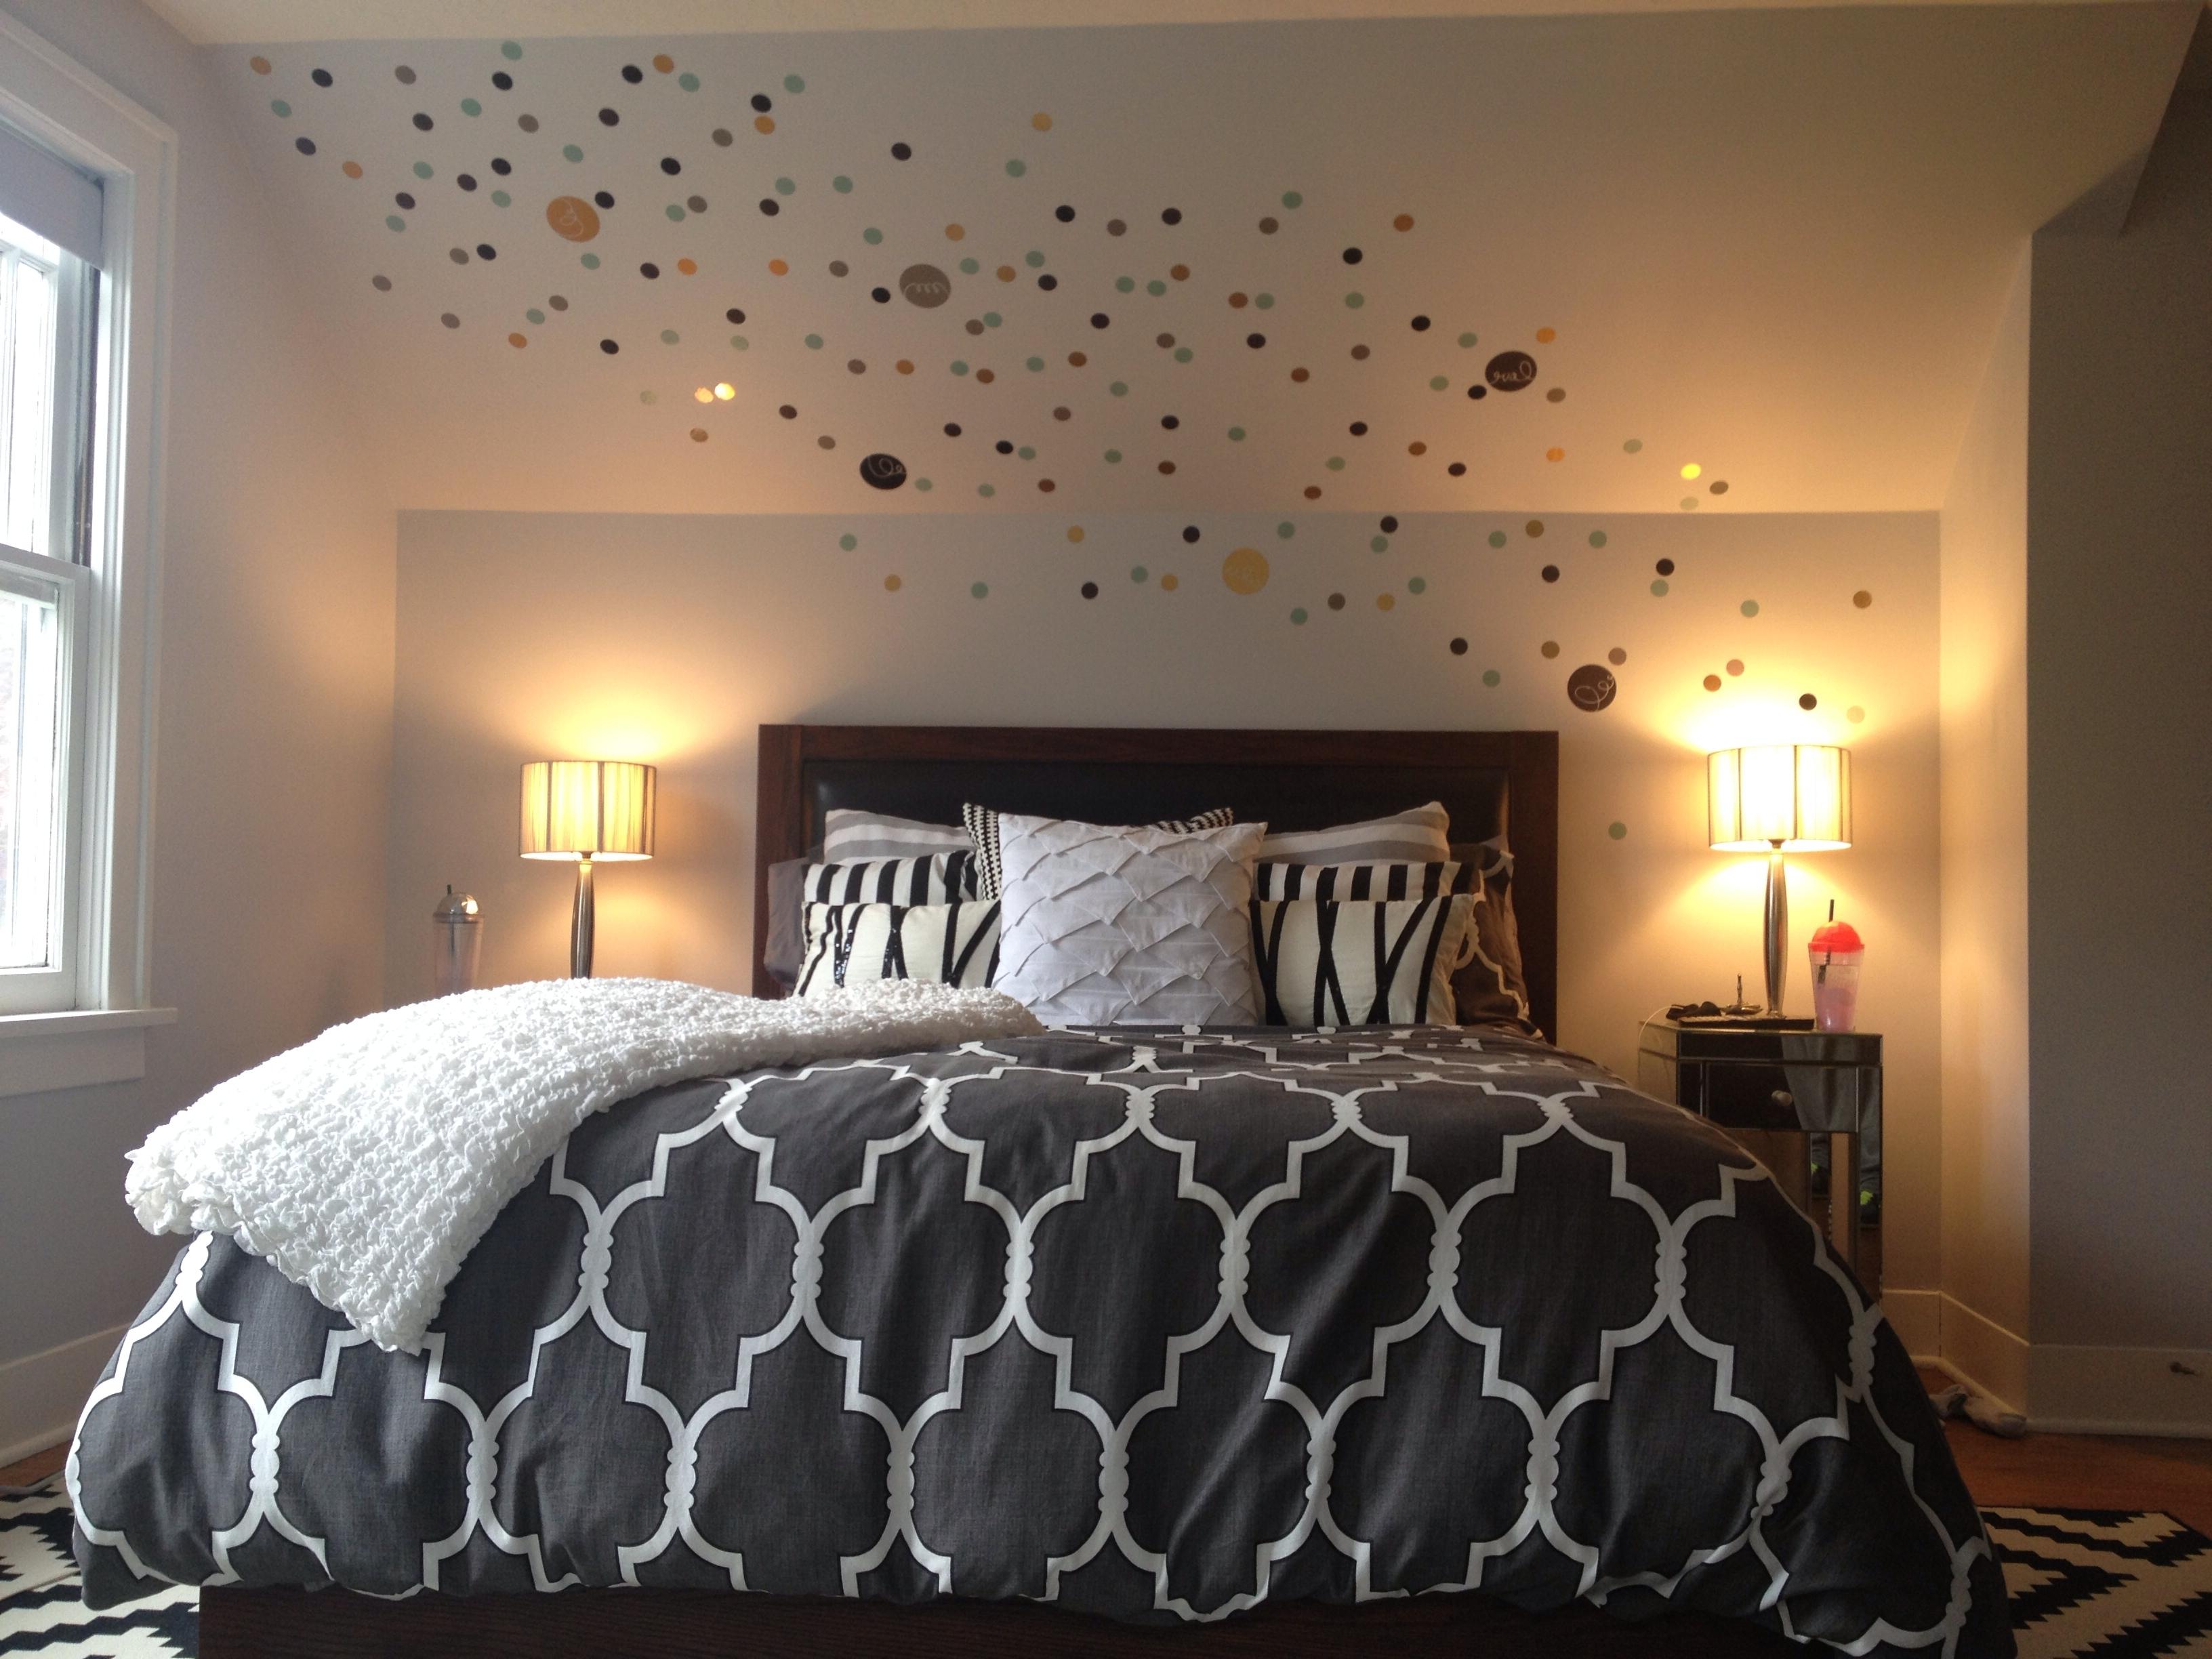 Bedroom Decor (Gallery 5 of 15)